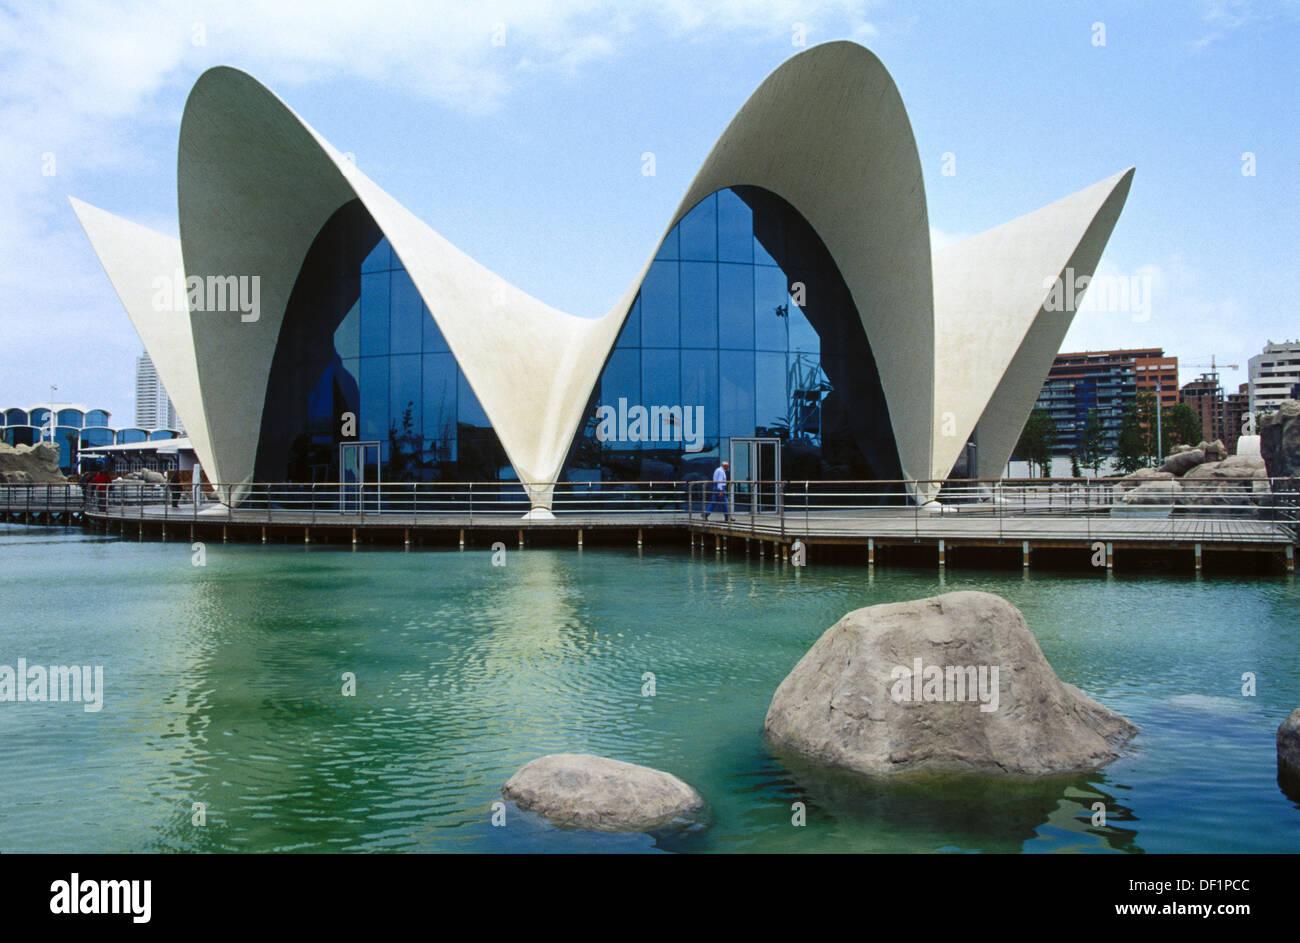 Oceanogr fic architect felix candela city of arts and for Muebles candela valencia